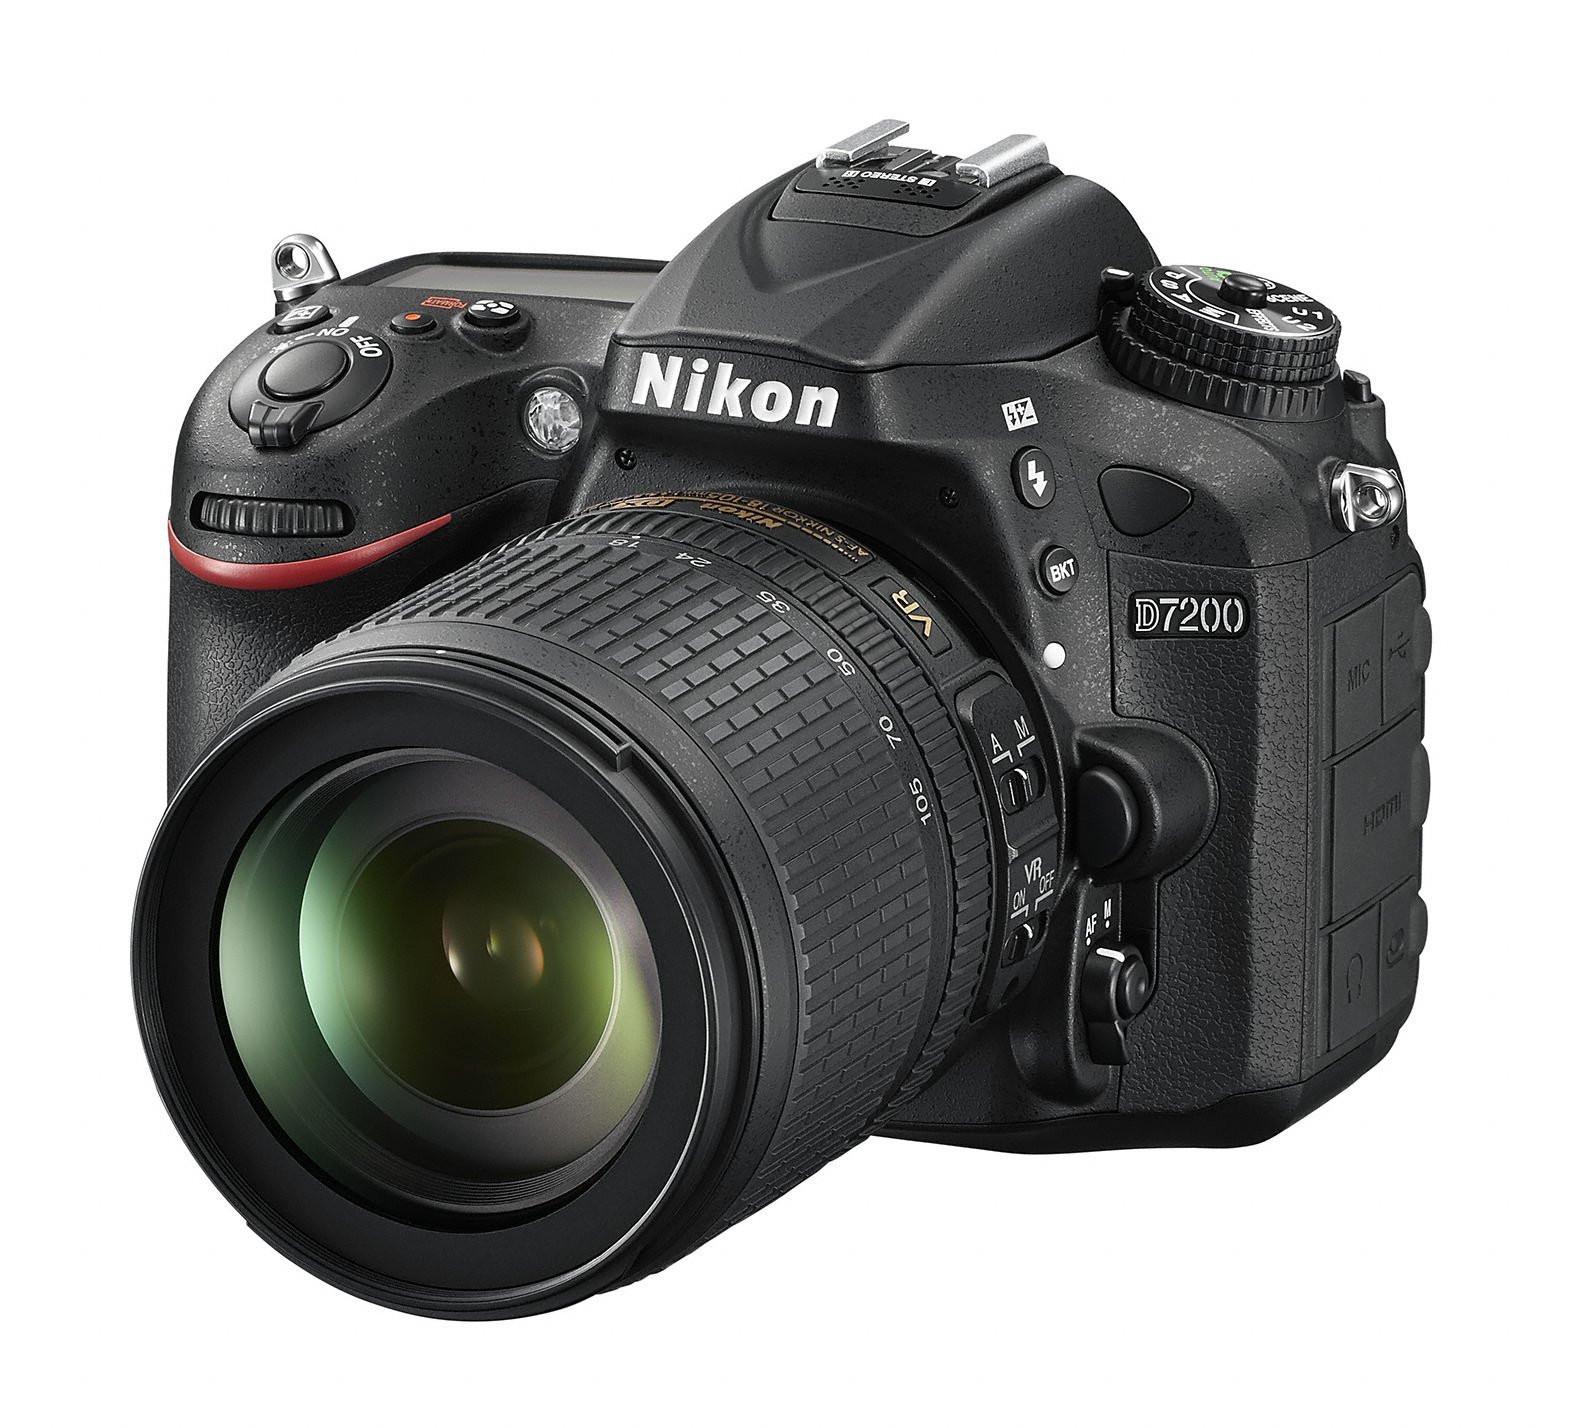 Digitale Spiegelreflexkamera: Nikon D7200 DSLR mit lichtstarkem ...